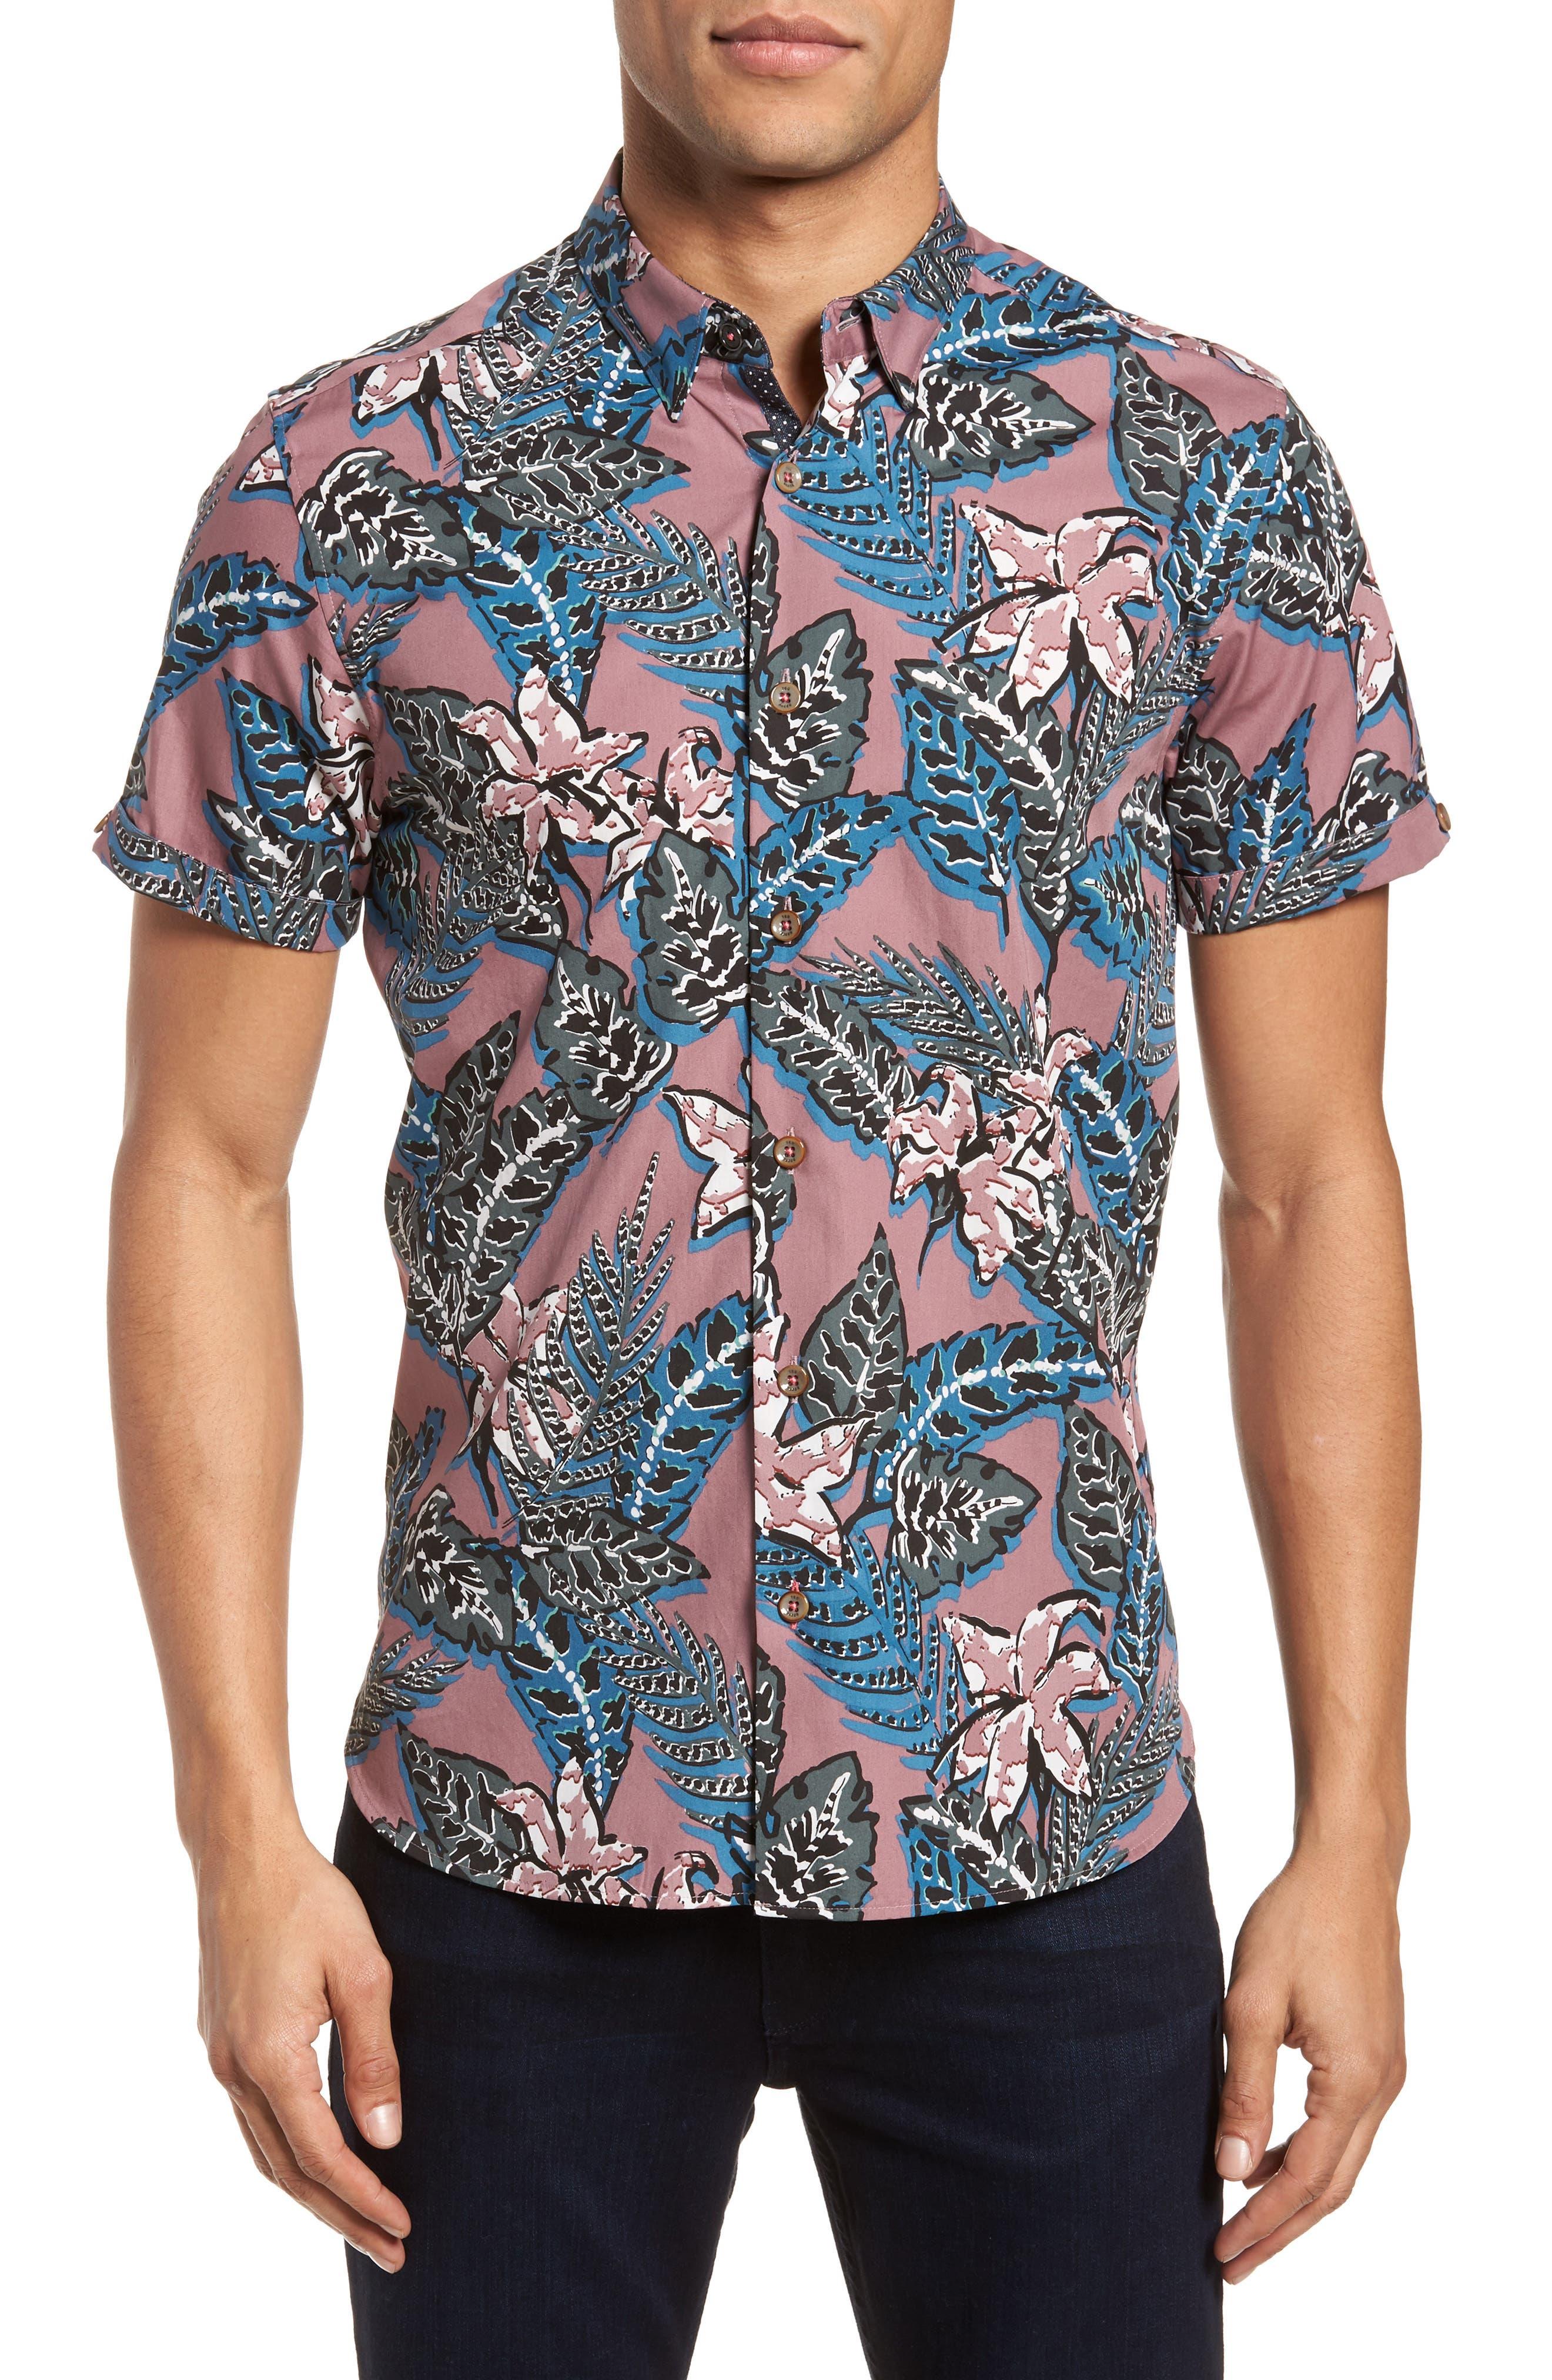 Clbtrop Trim Fit Tropical Woven Shirt,                         Main,                         color, Pink